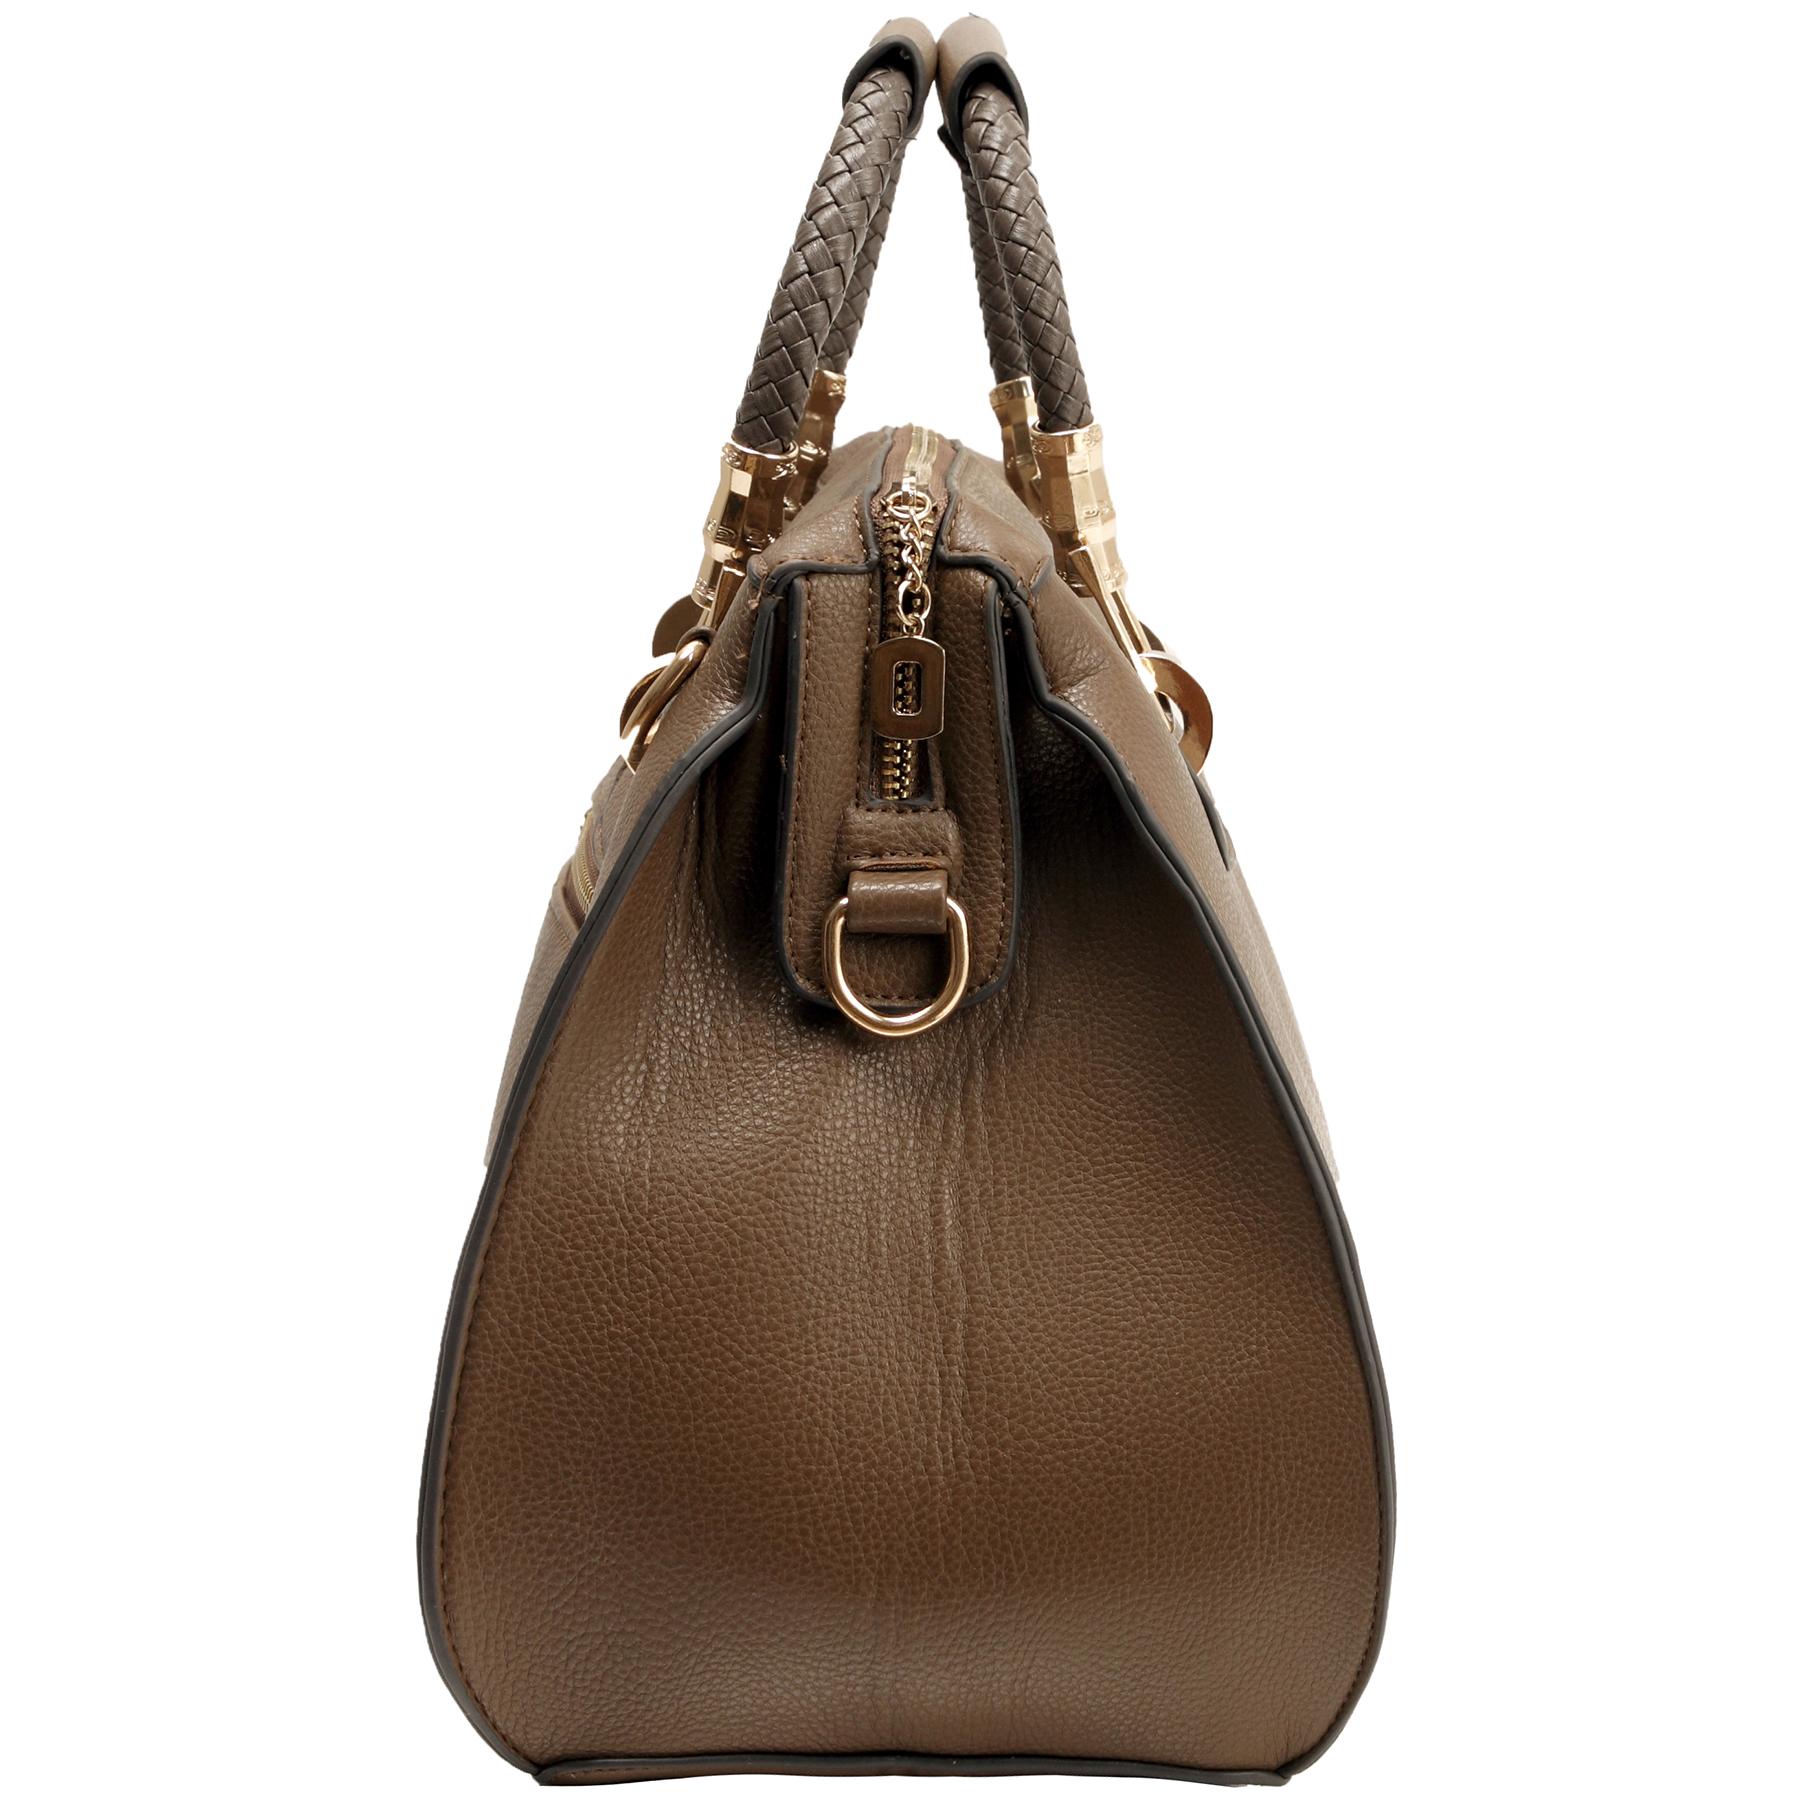 MARISSA Taupe Doctor Style Handbag Side